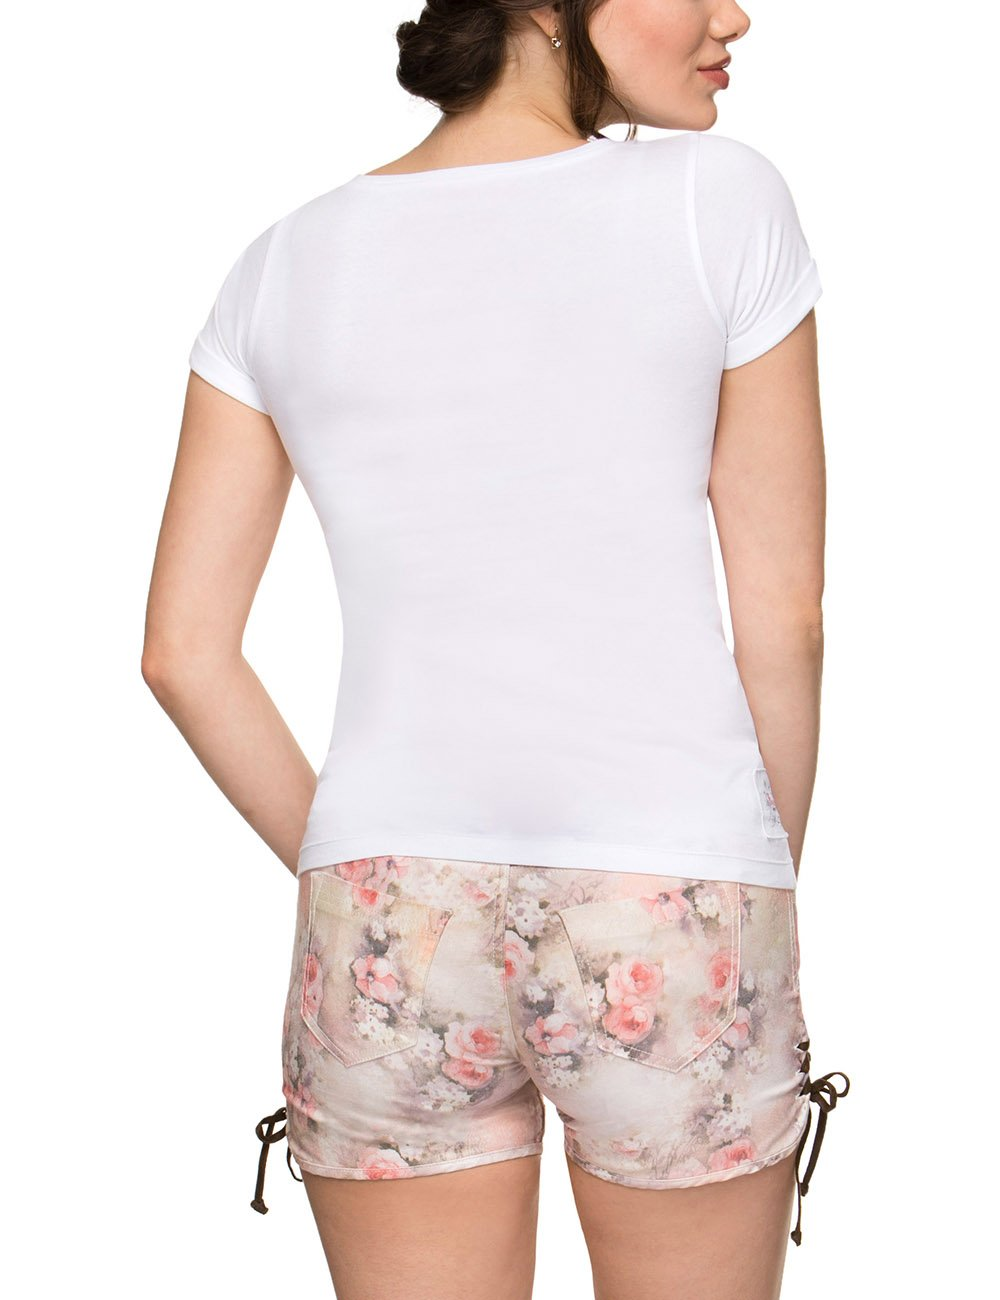 Bávarotirolés Para Shirt Estilo Nica Traje Camiseta Tradicional qw4gXZzx